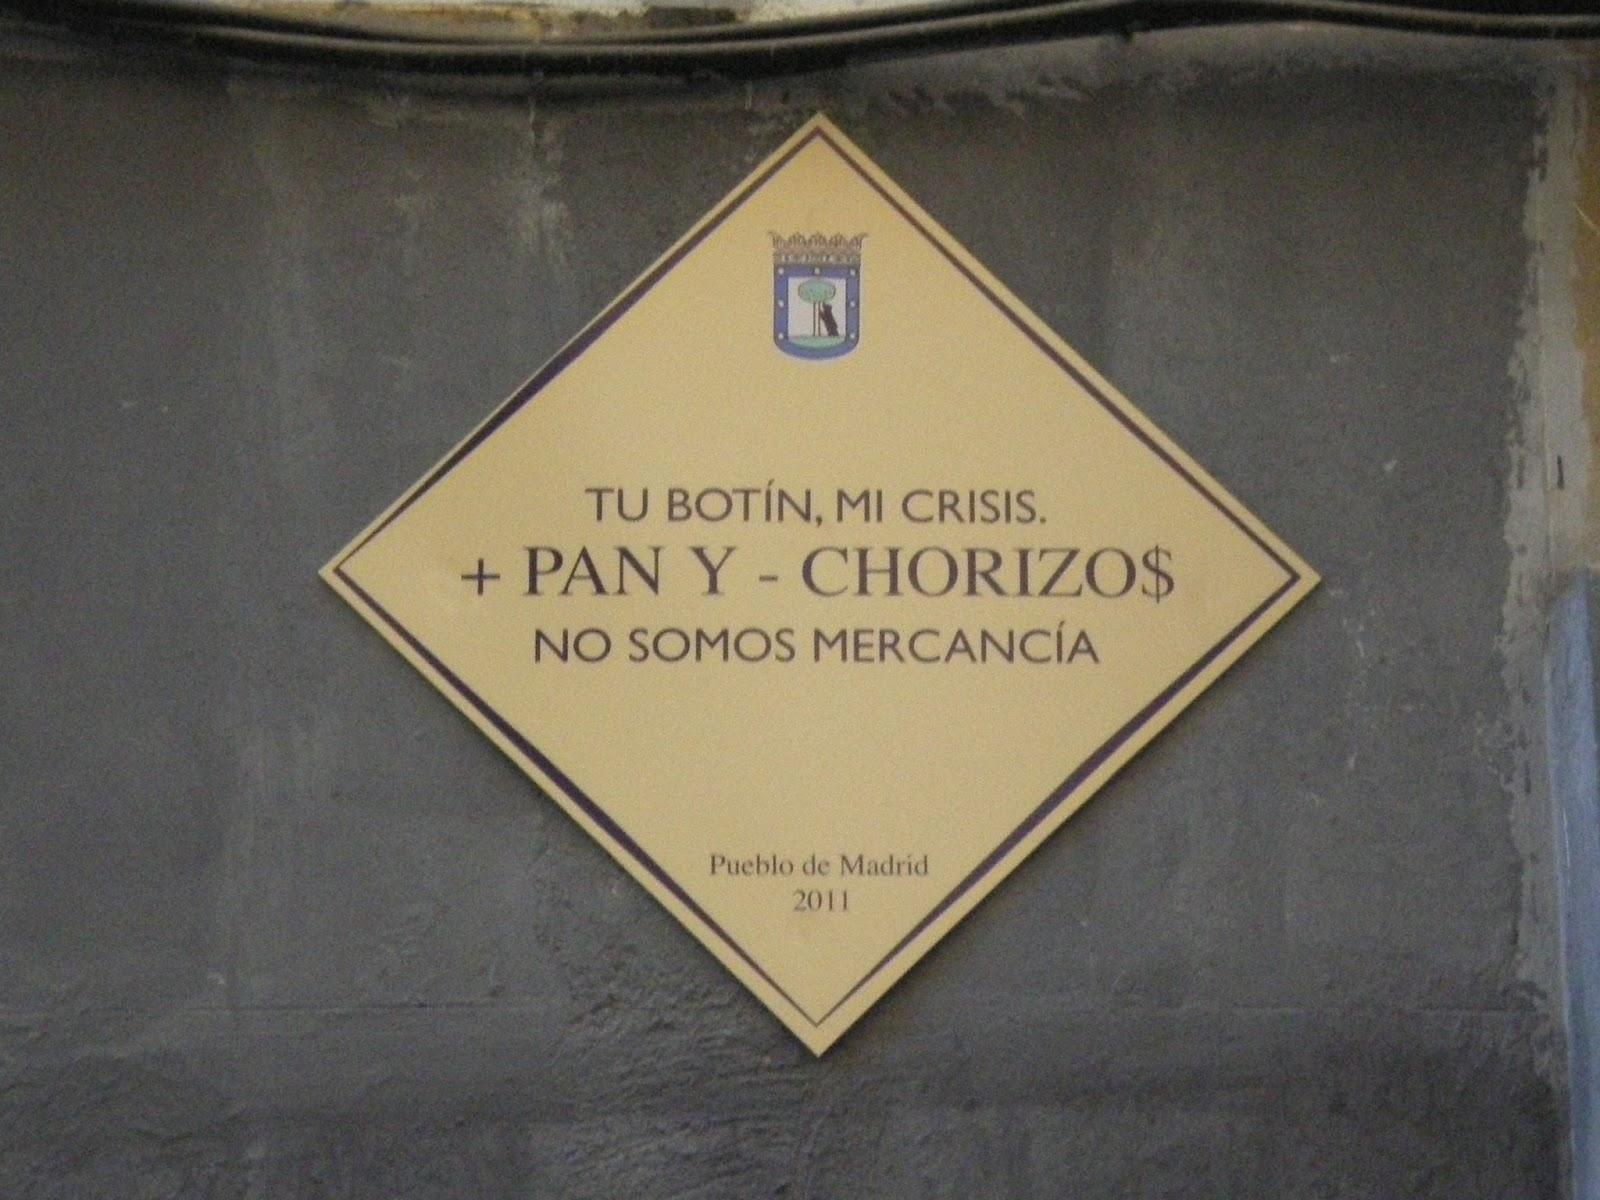 + pan y - chorizos